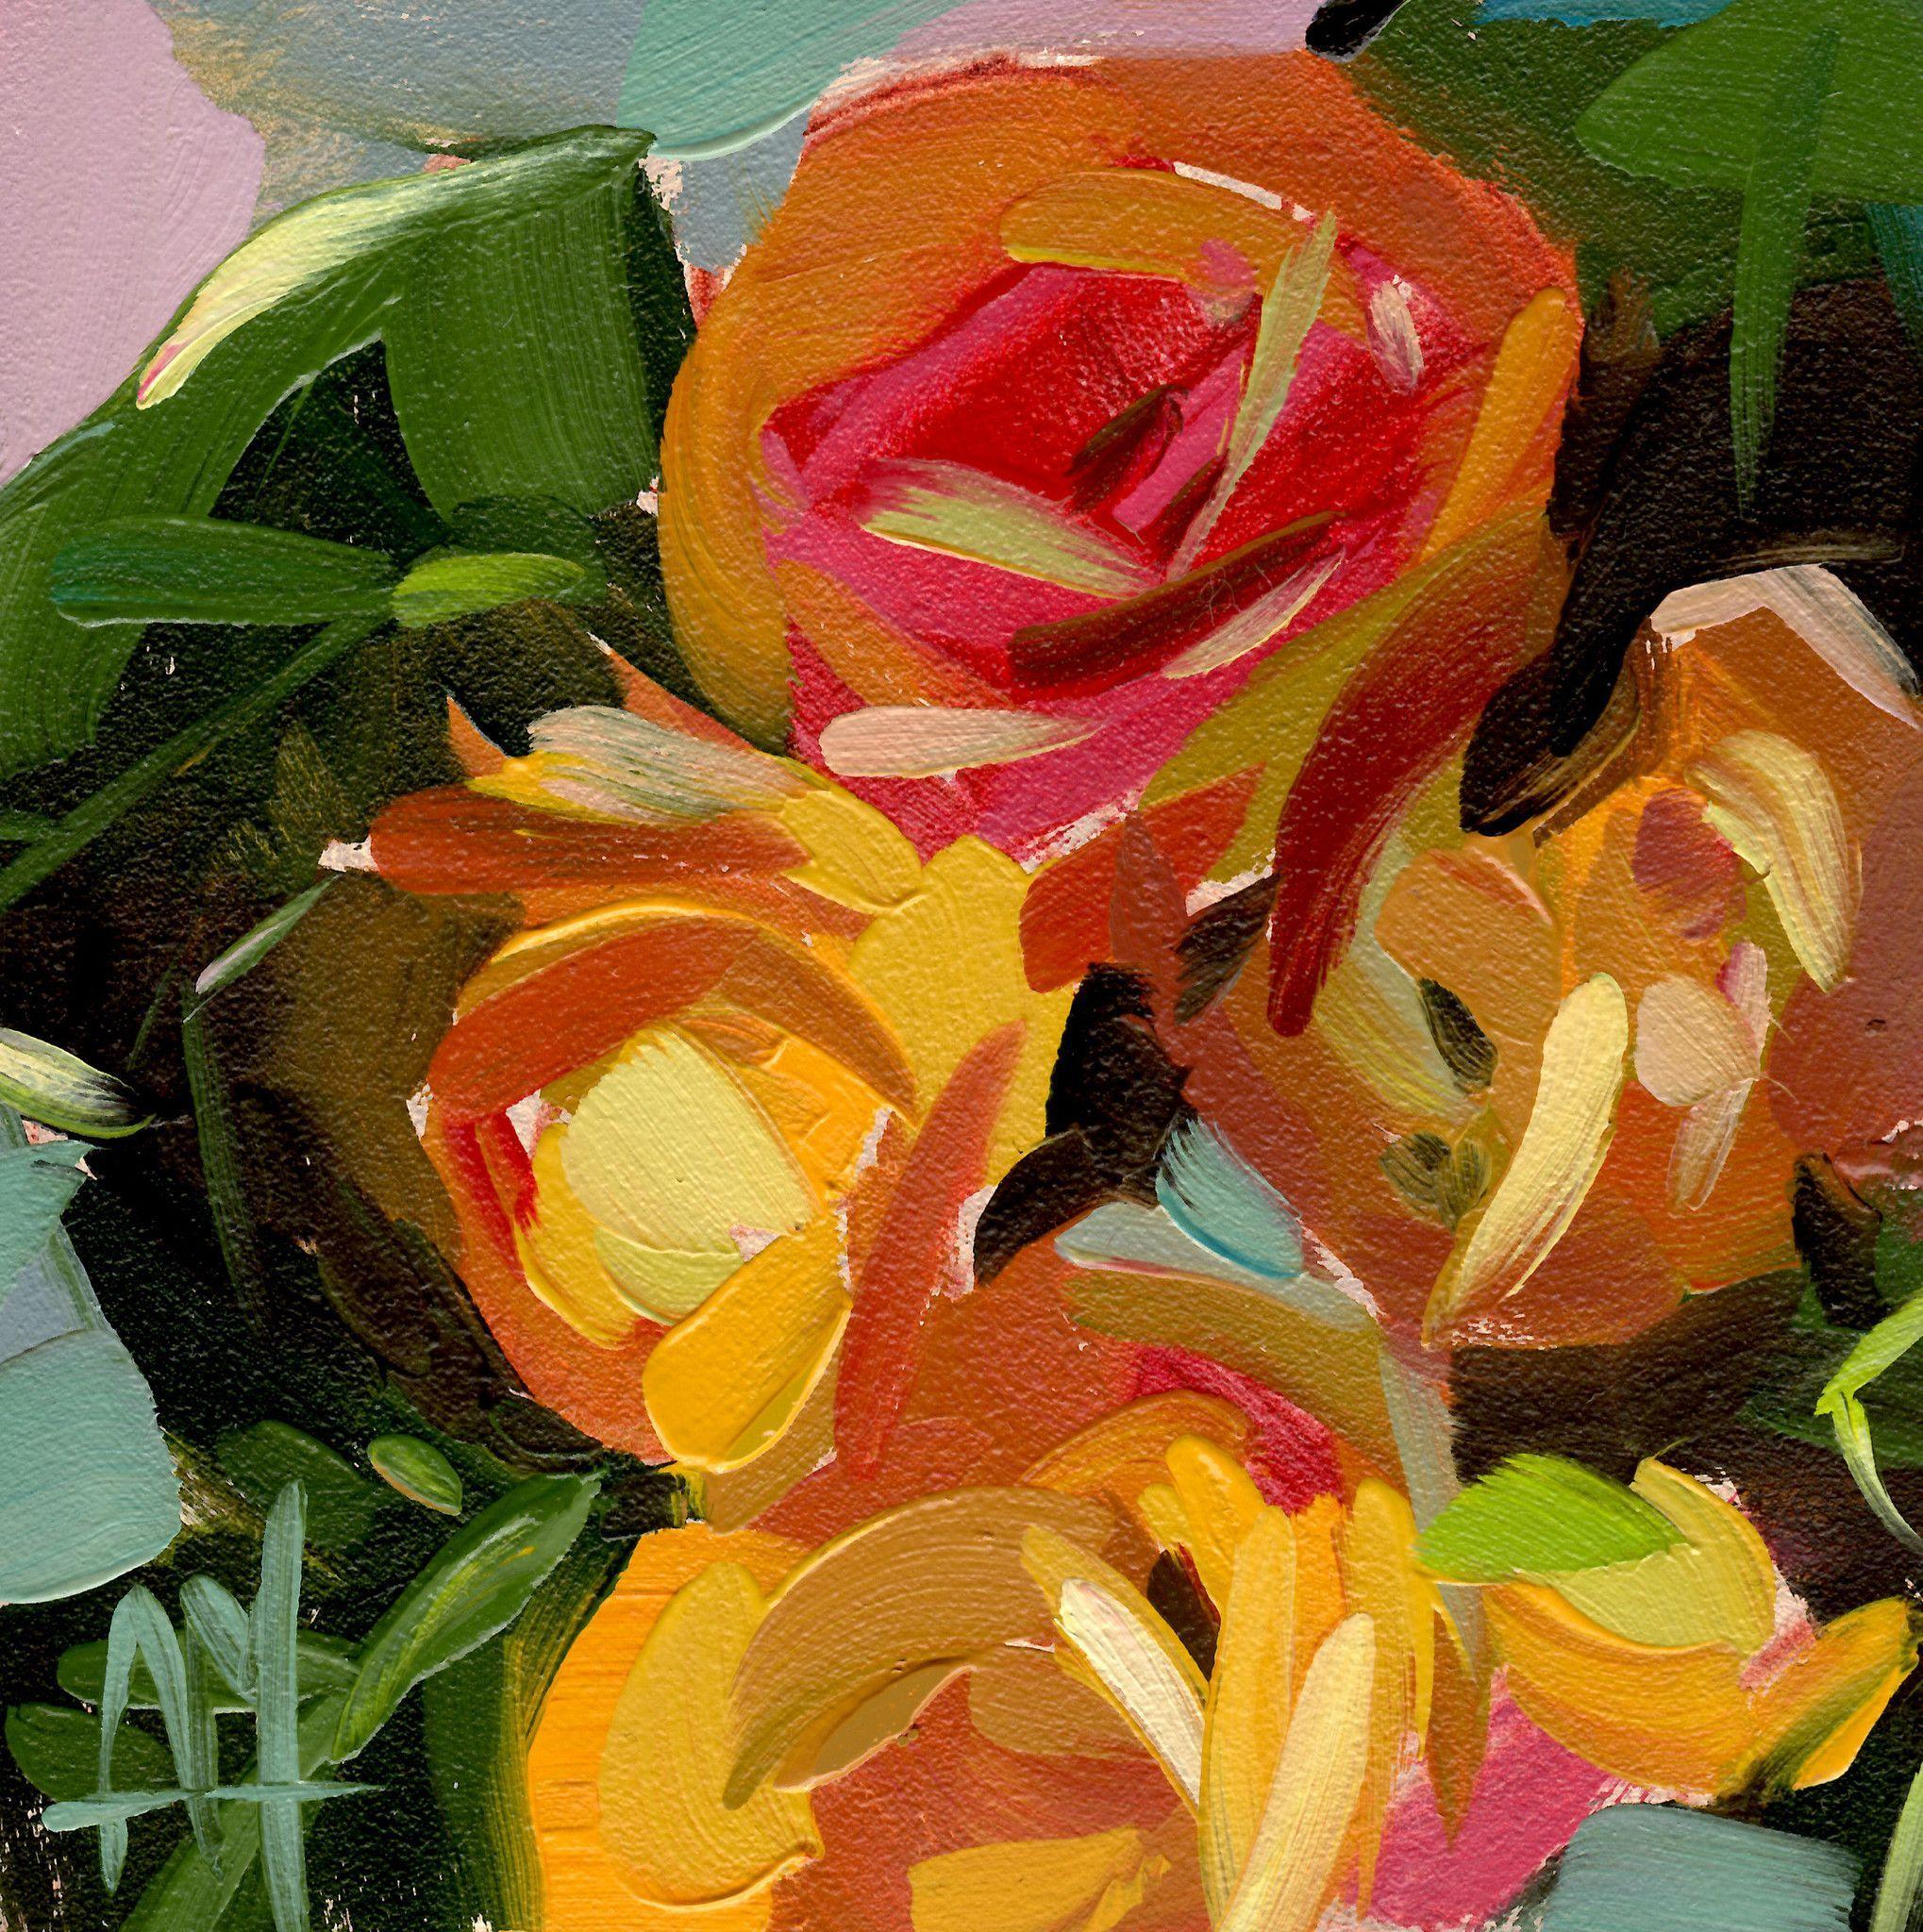 Orange Ranunculus Flowers Print by Angela Moulton 8 x 8